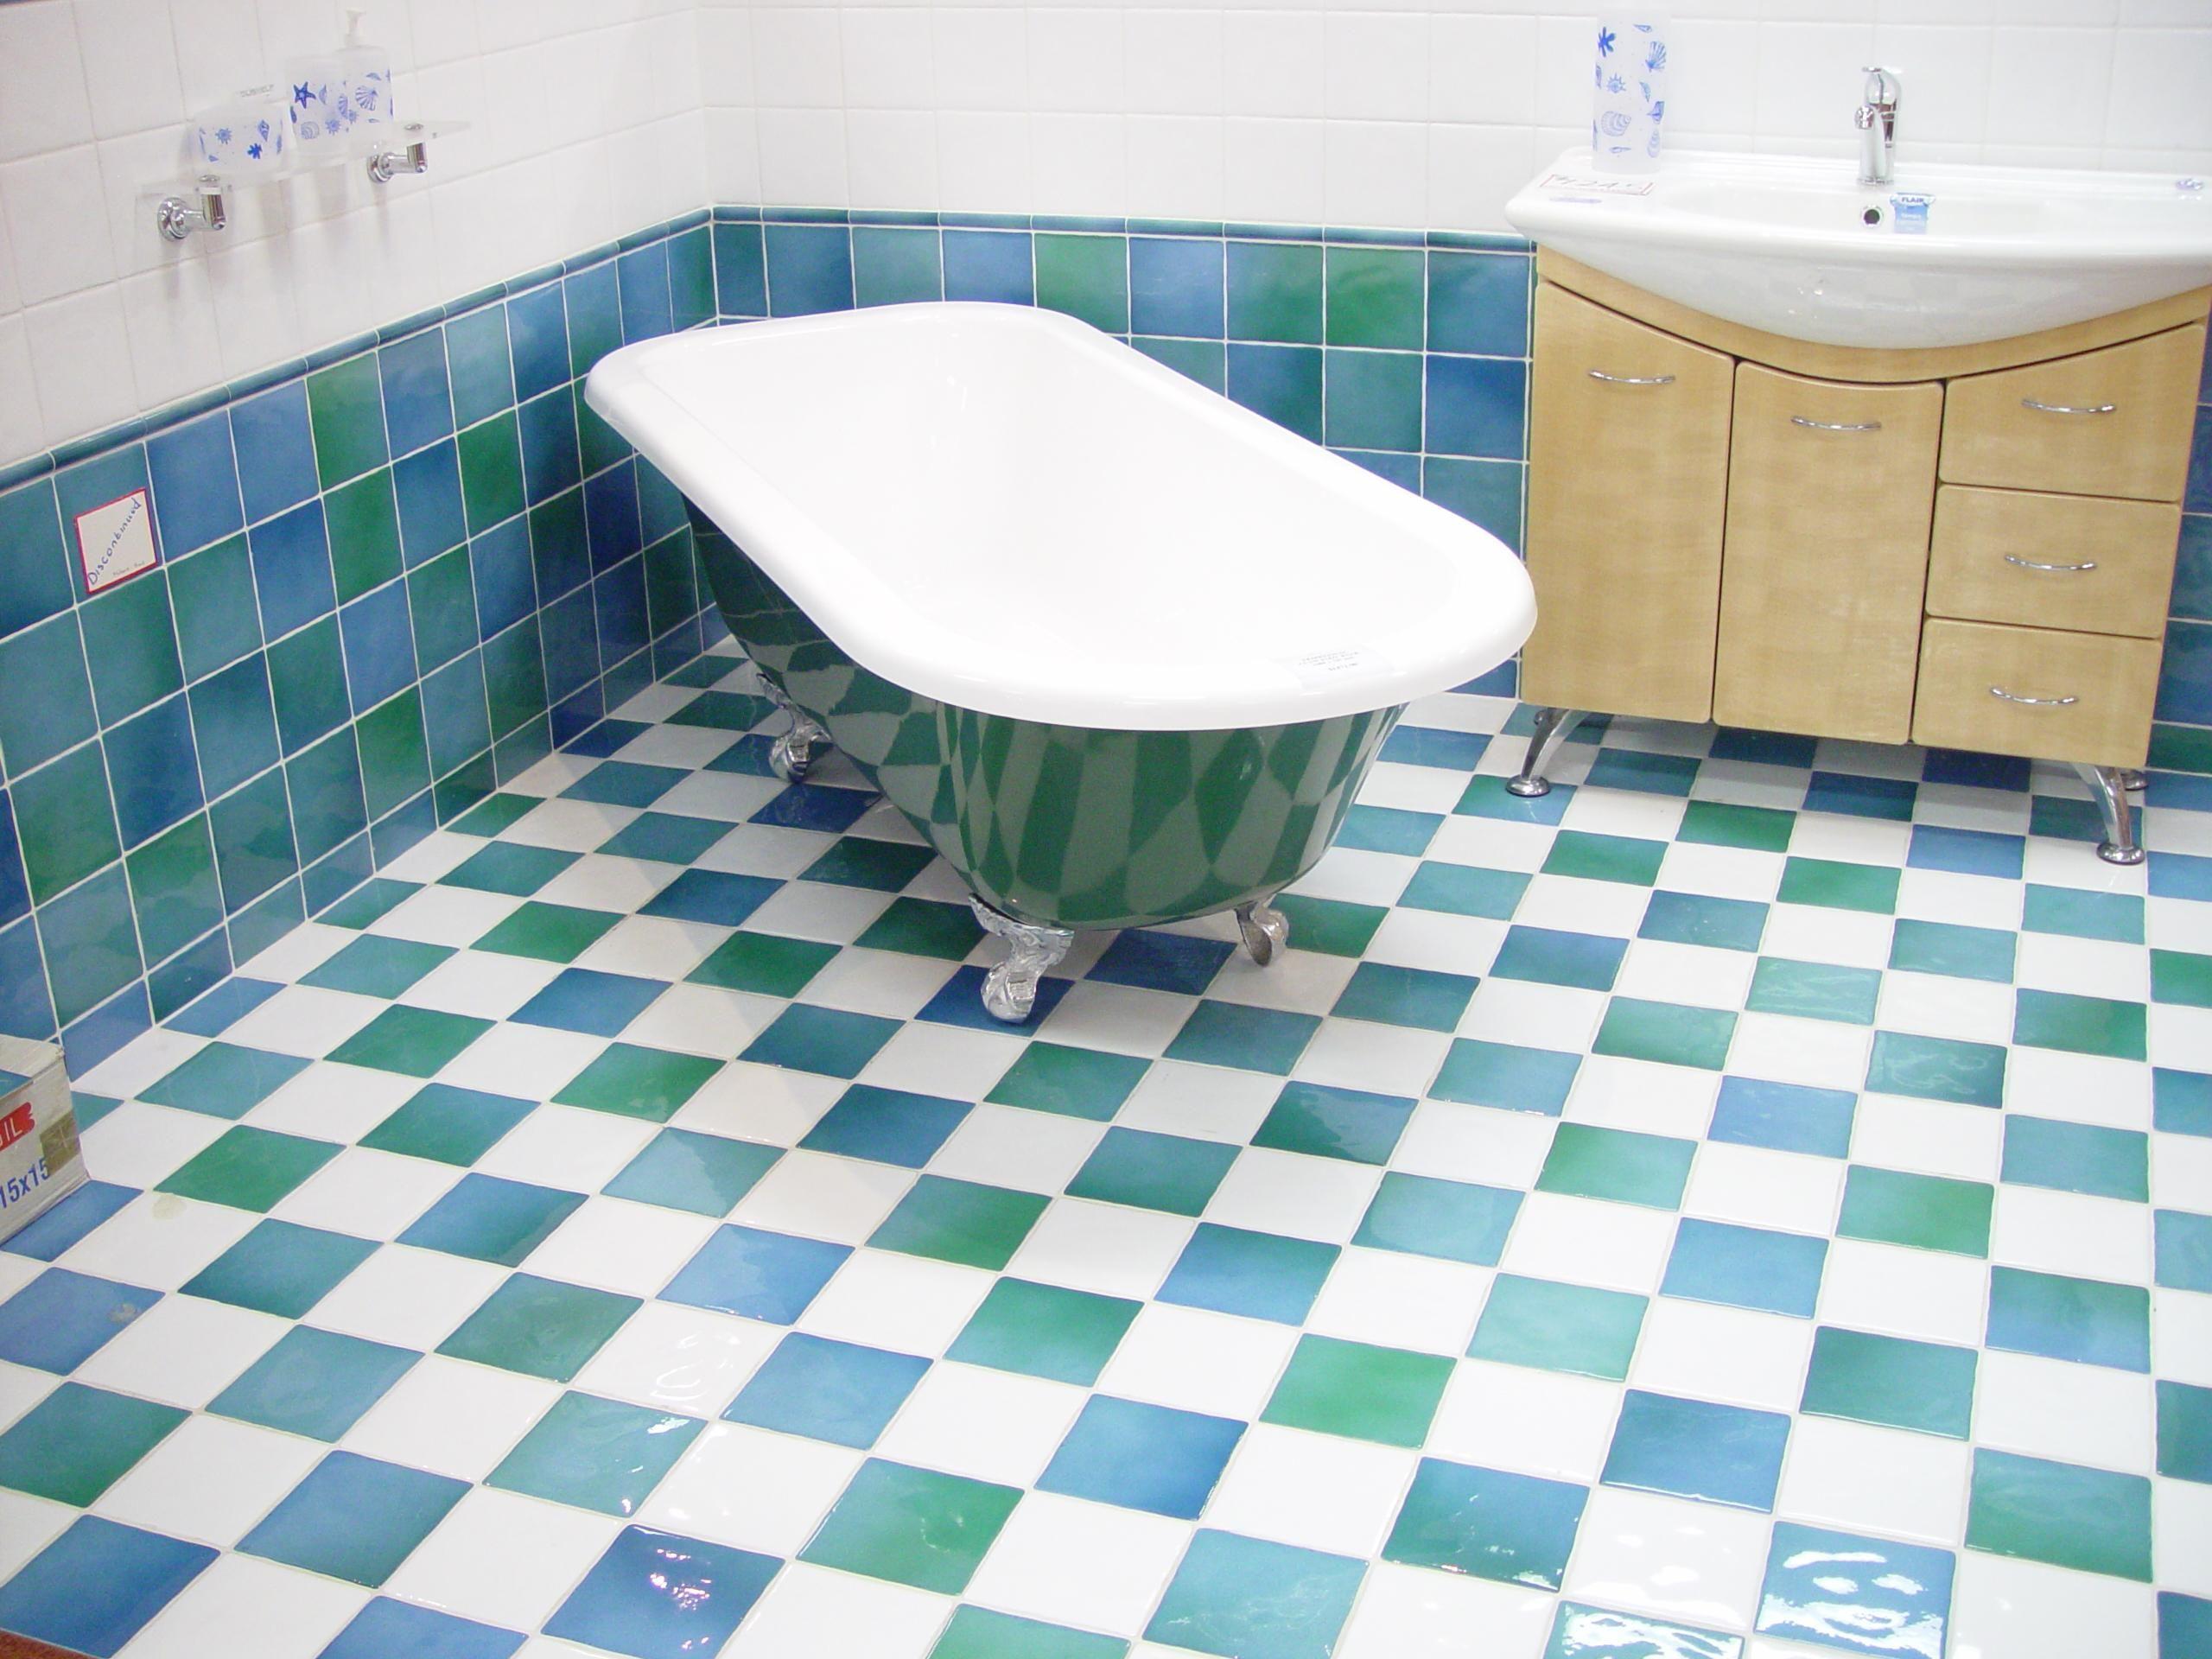 Foto gratis: vasca da bagno verde blu bianco piastrelle